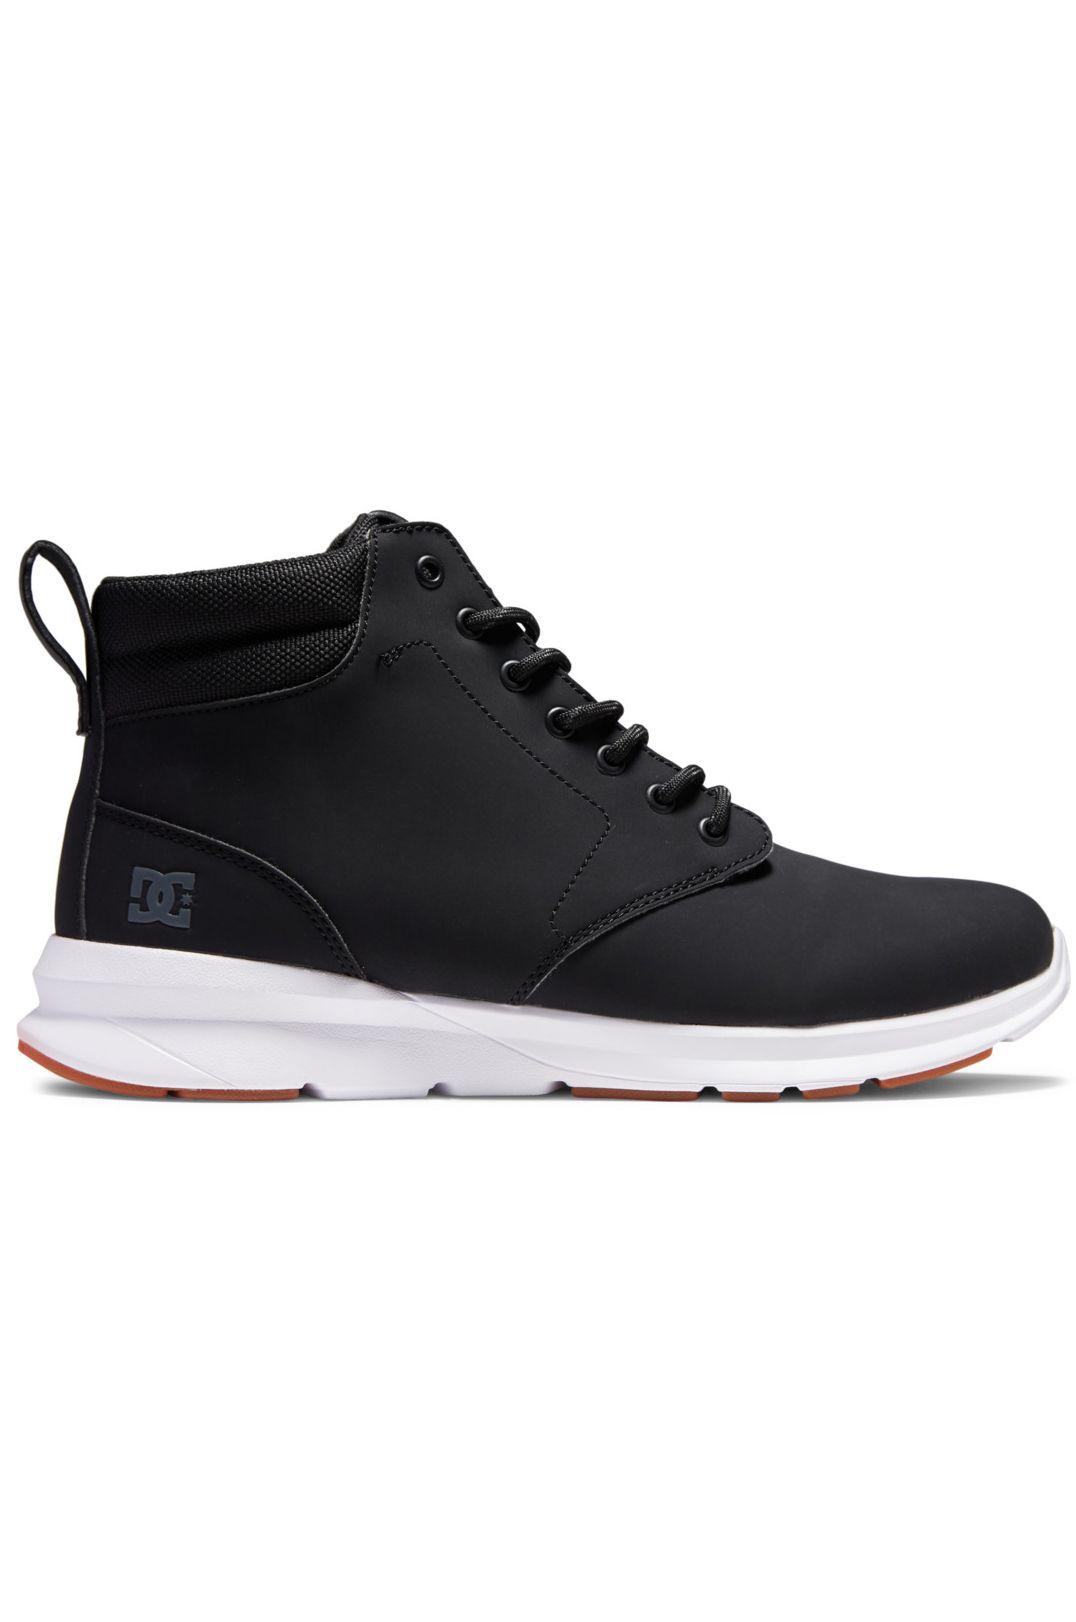 DC Shoes Boots MASON 2 Black/White